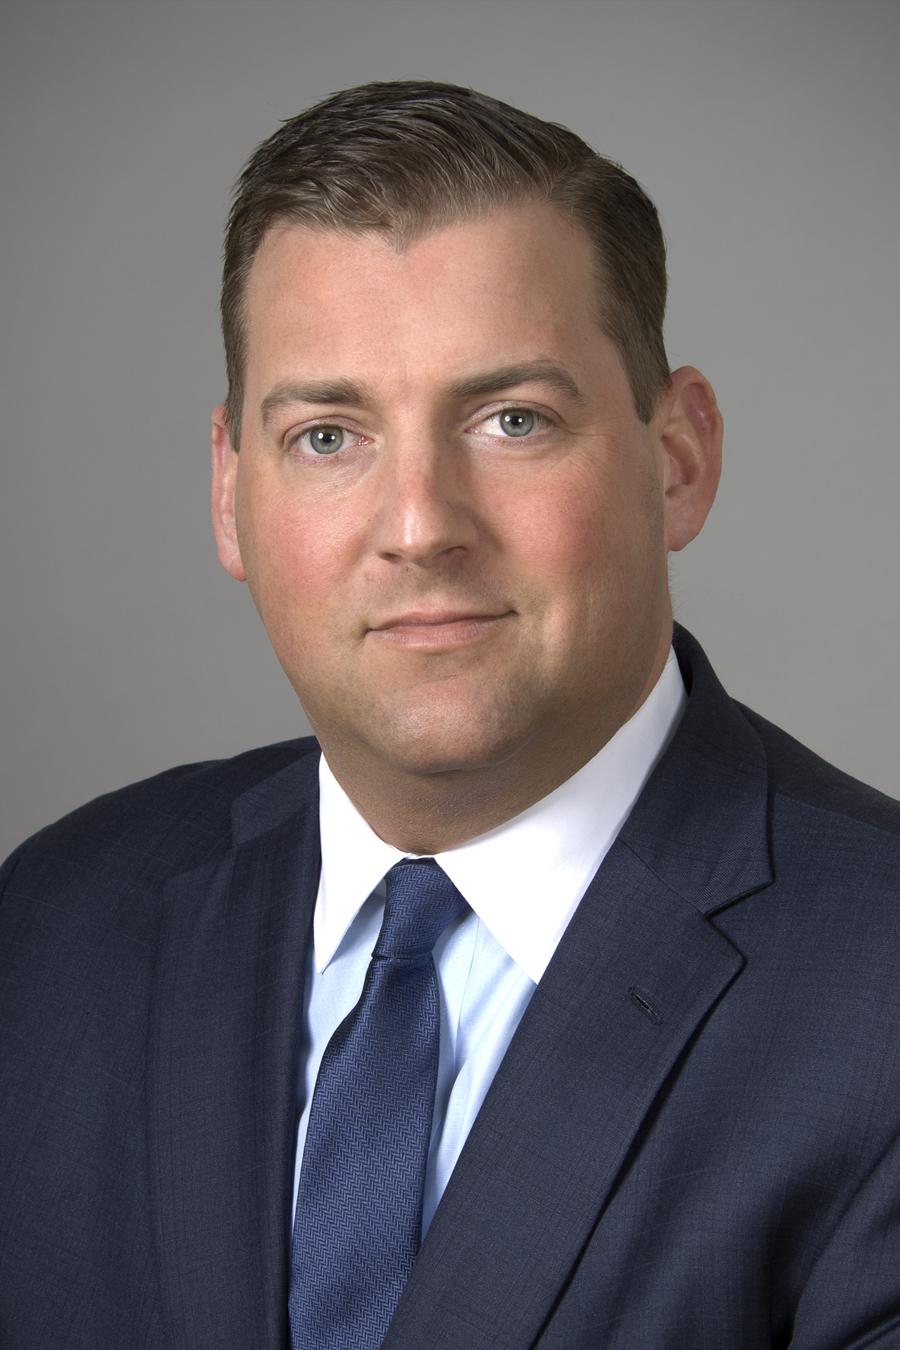 Daniel J. Ujczo